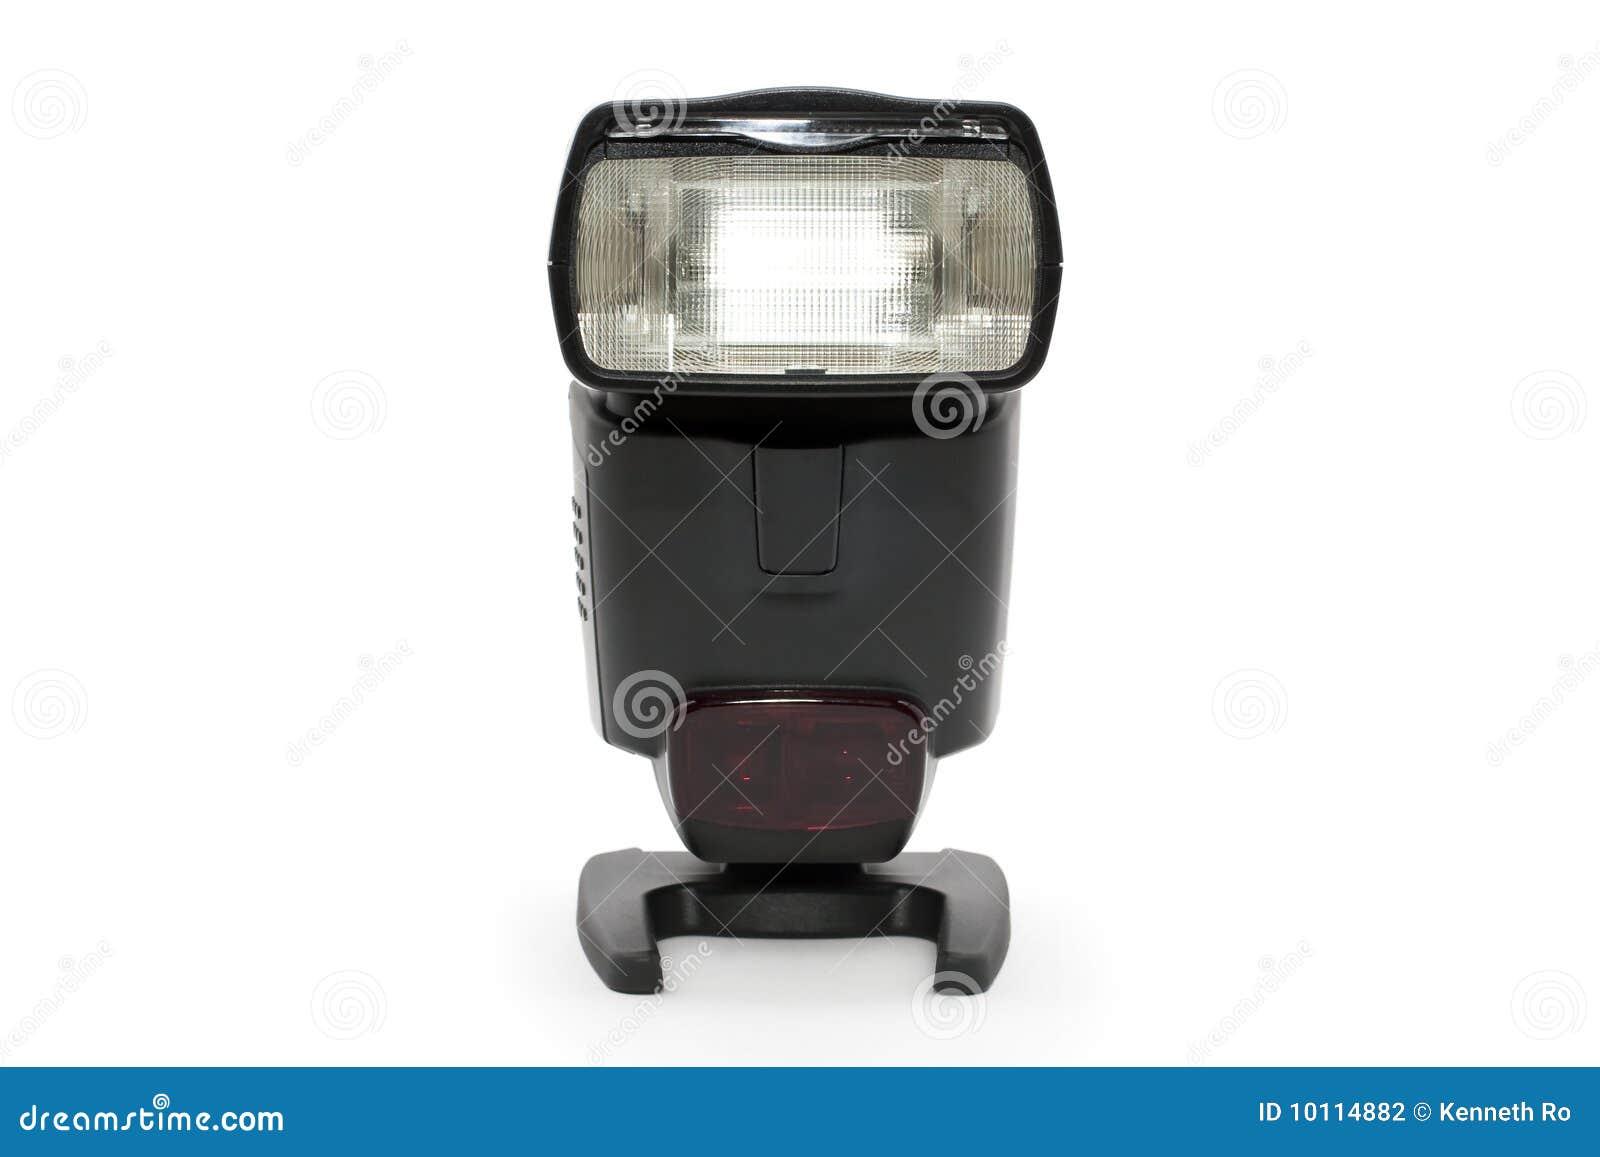 Camera Strobe Light : Strobe flash light stock photography image